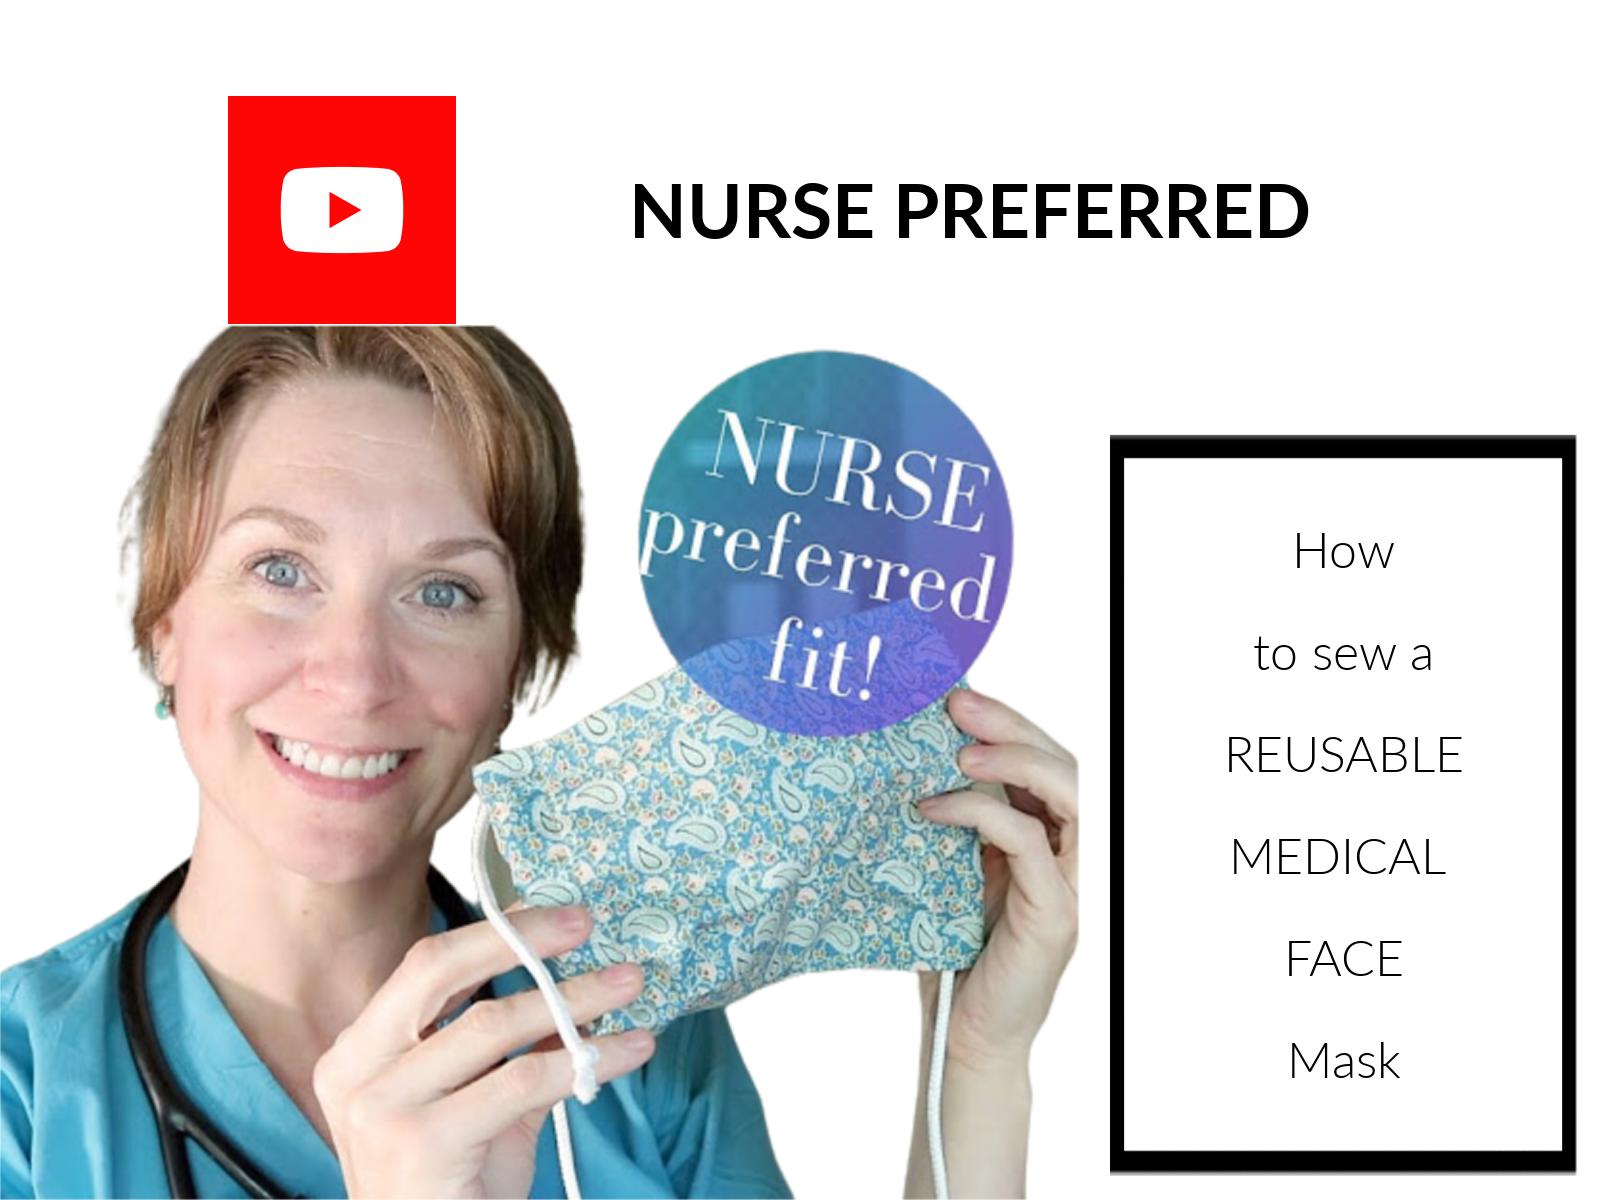 Nurse Preferred